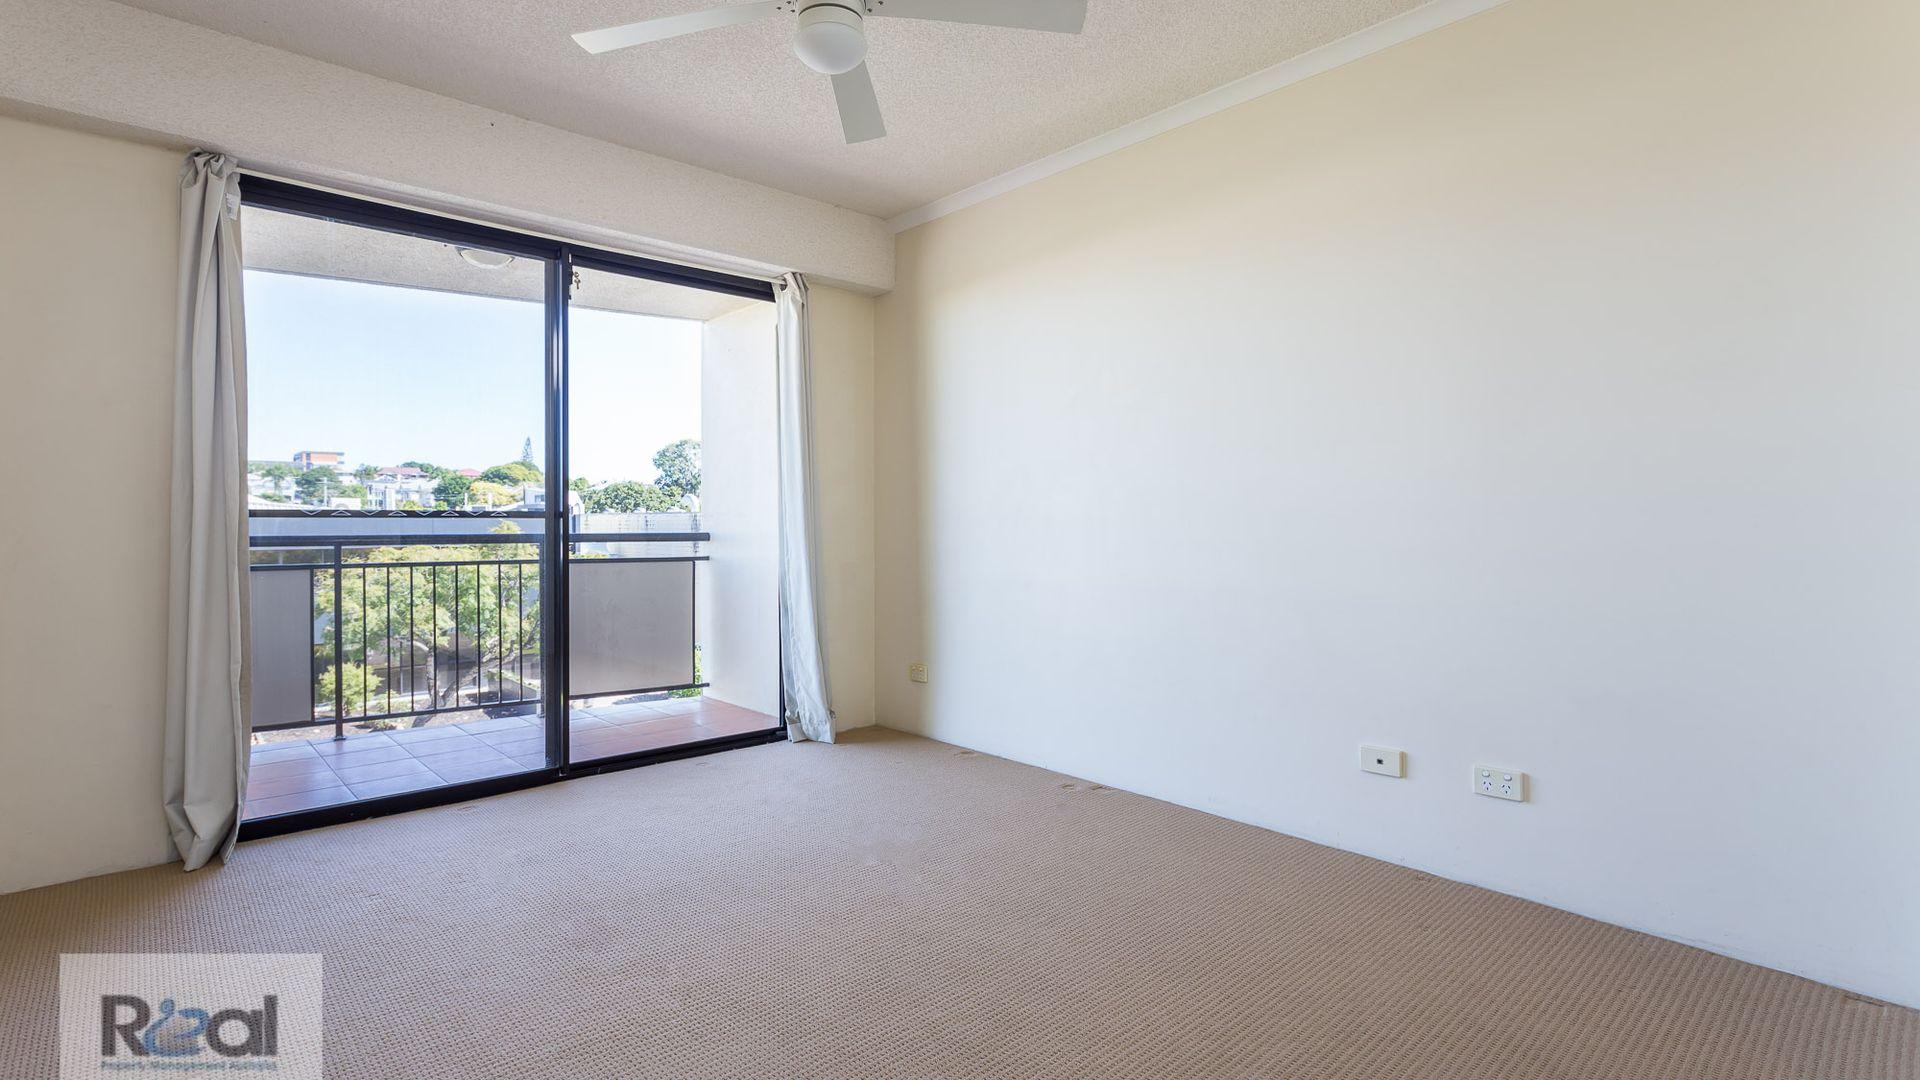 44 //45 55 Harries Road, Coorparoo QLD 4151, Image 1